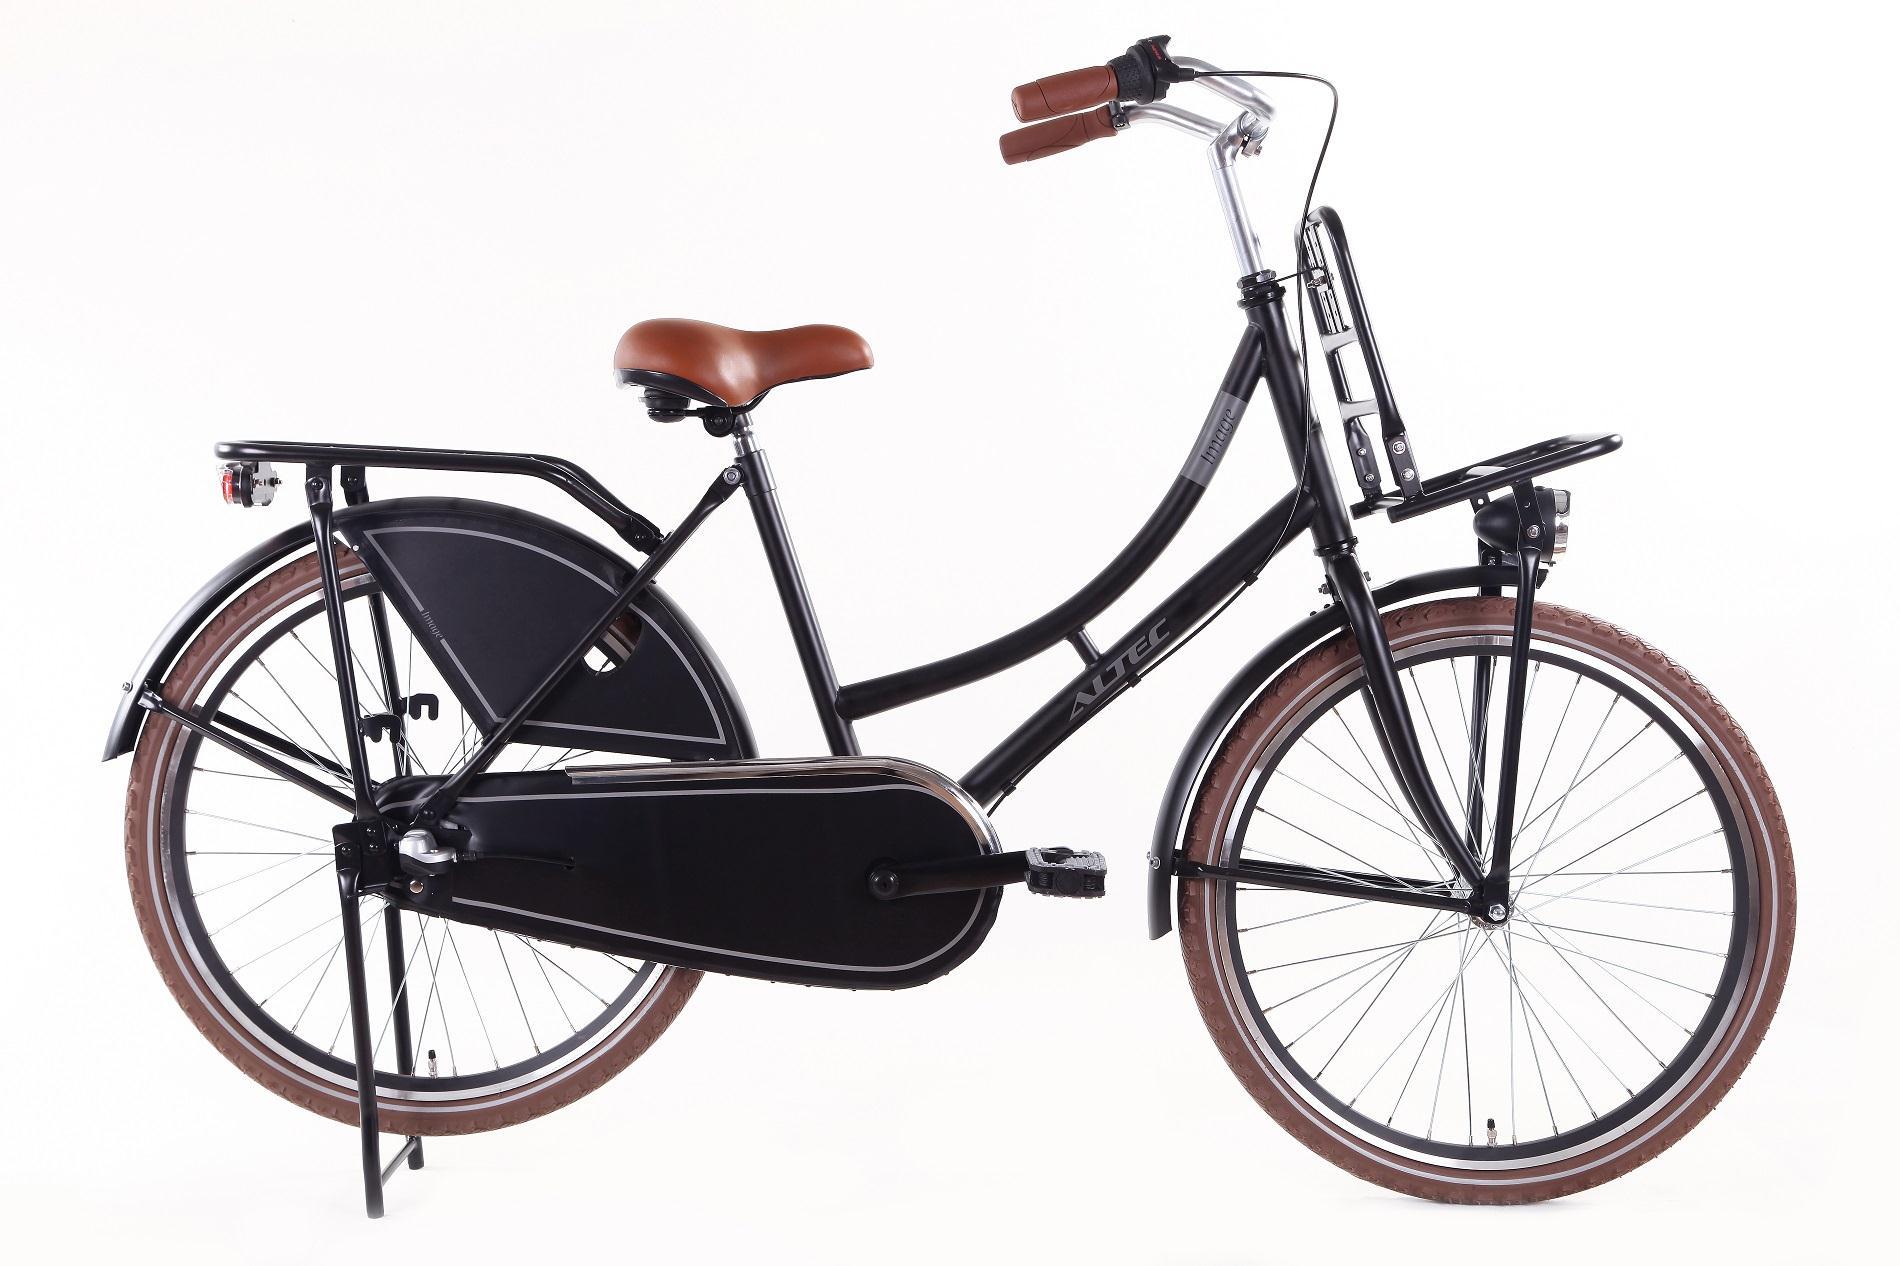 damen das hollandrad kultiges fahrrad f r stadt und land. Black Bedroom Furniture Sets. Home Design Ideas